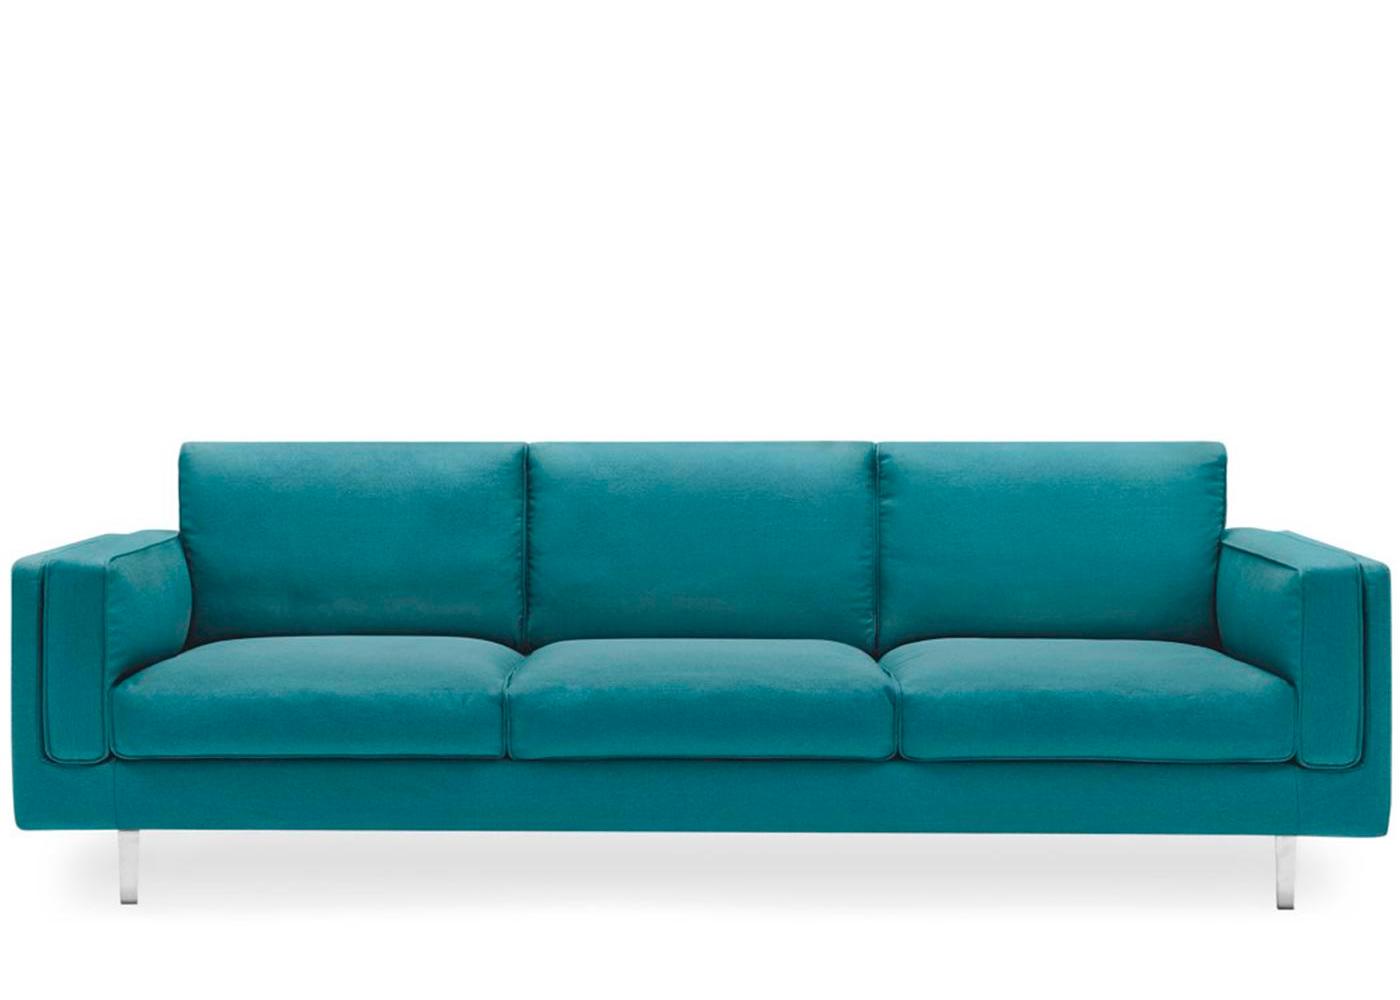 calligaris sofas uk small scale sofa sleeper metro midfurn furniture superstore